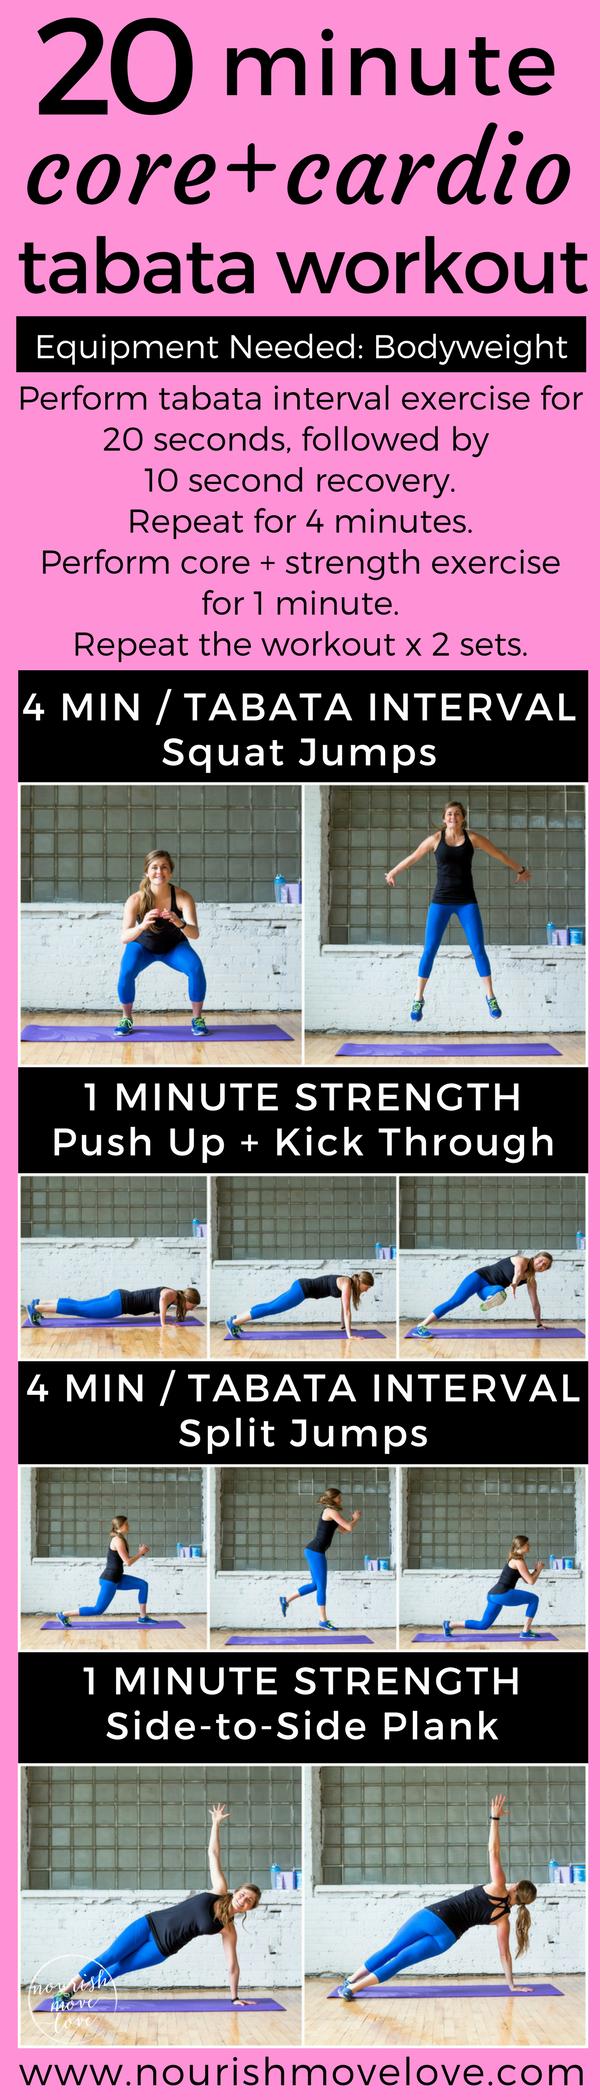 20-Minute Bodyweight Tabata Workout | Nourish Move Love